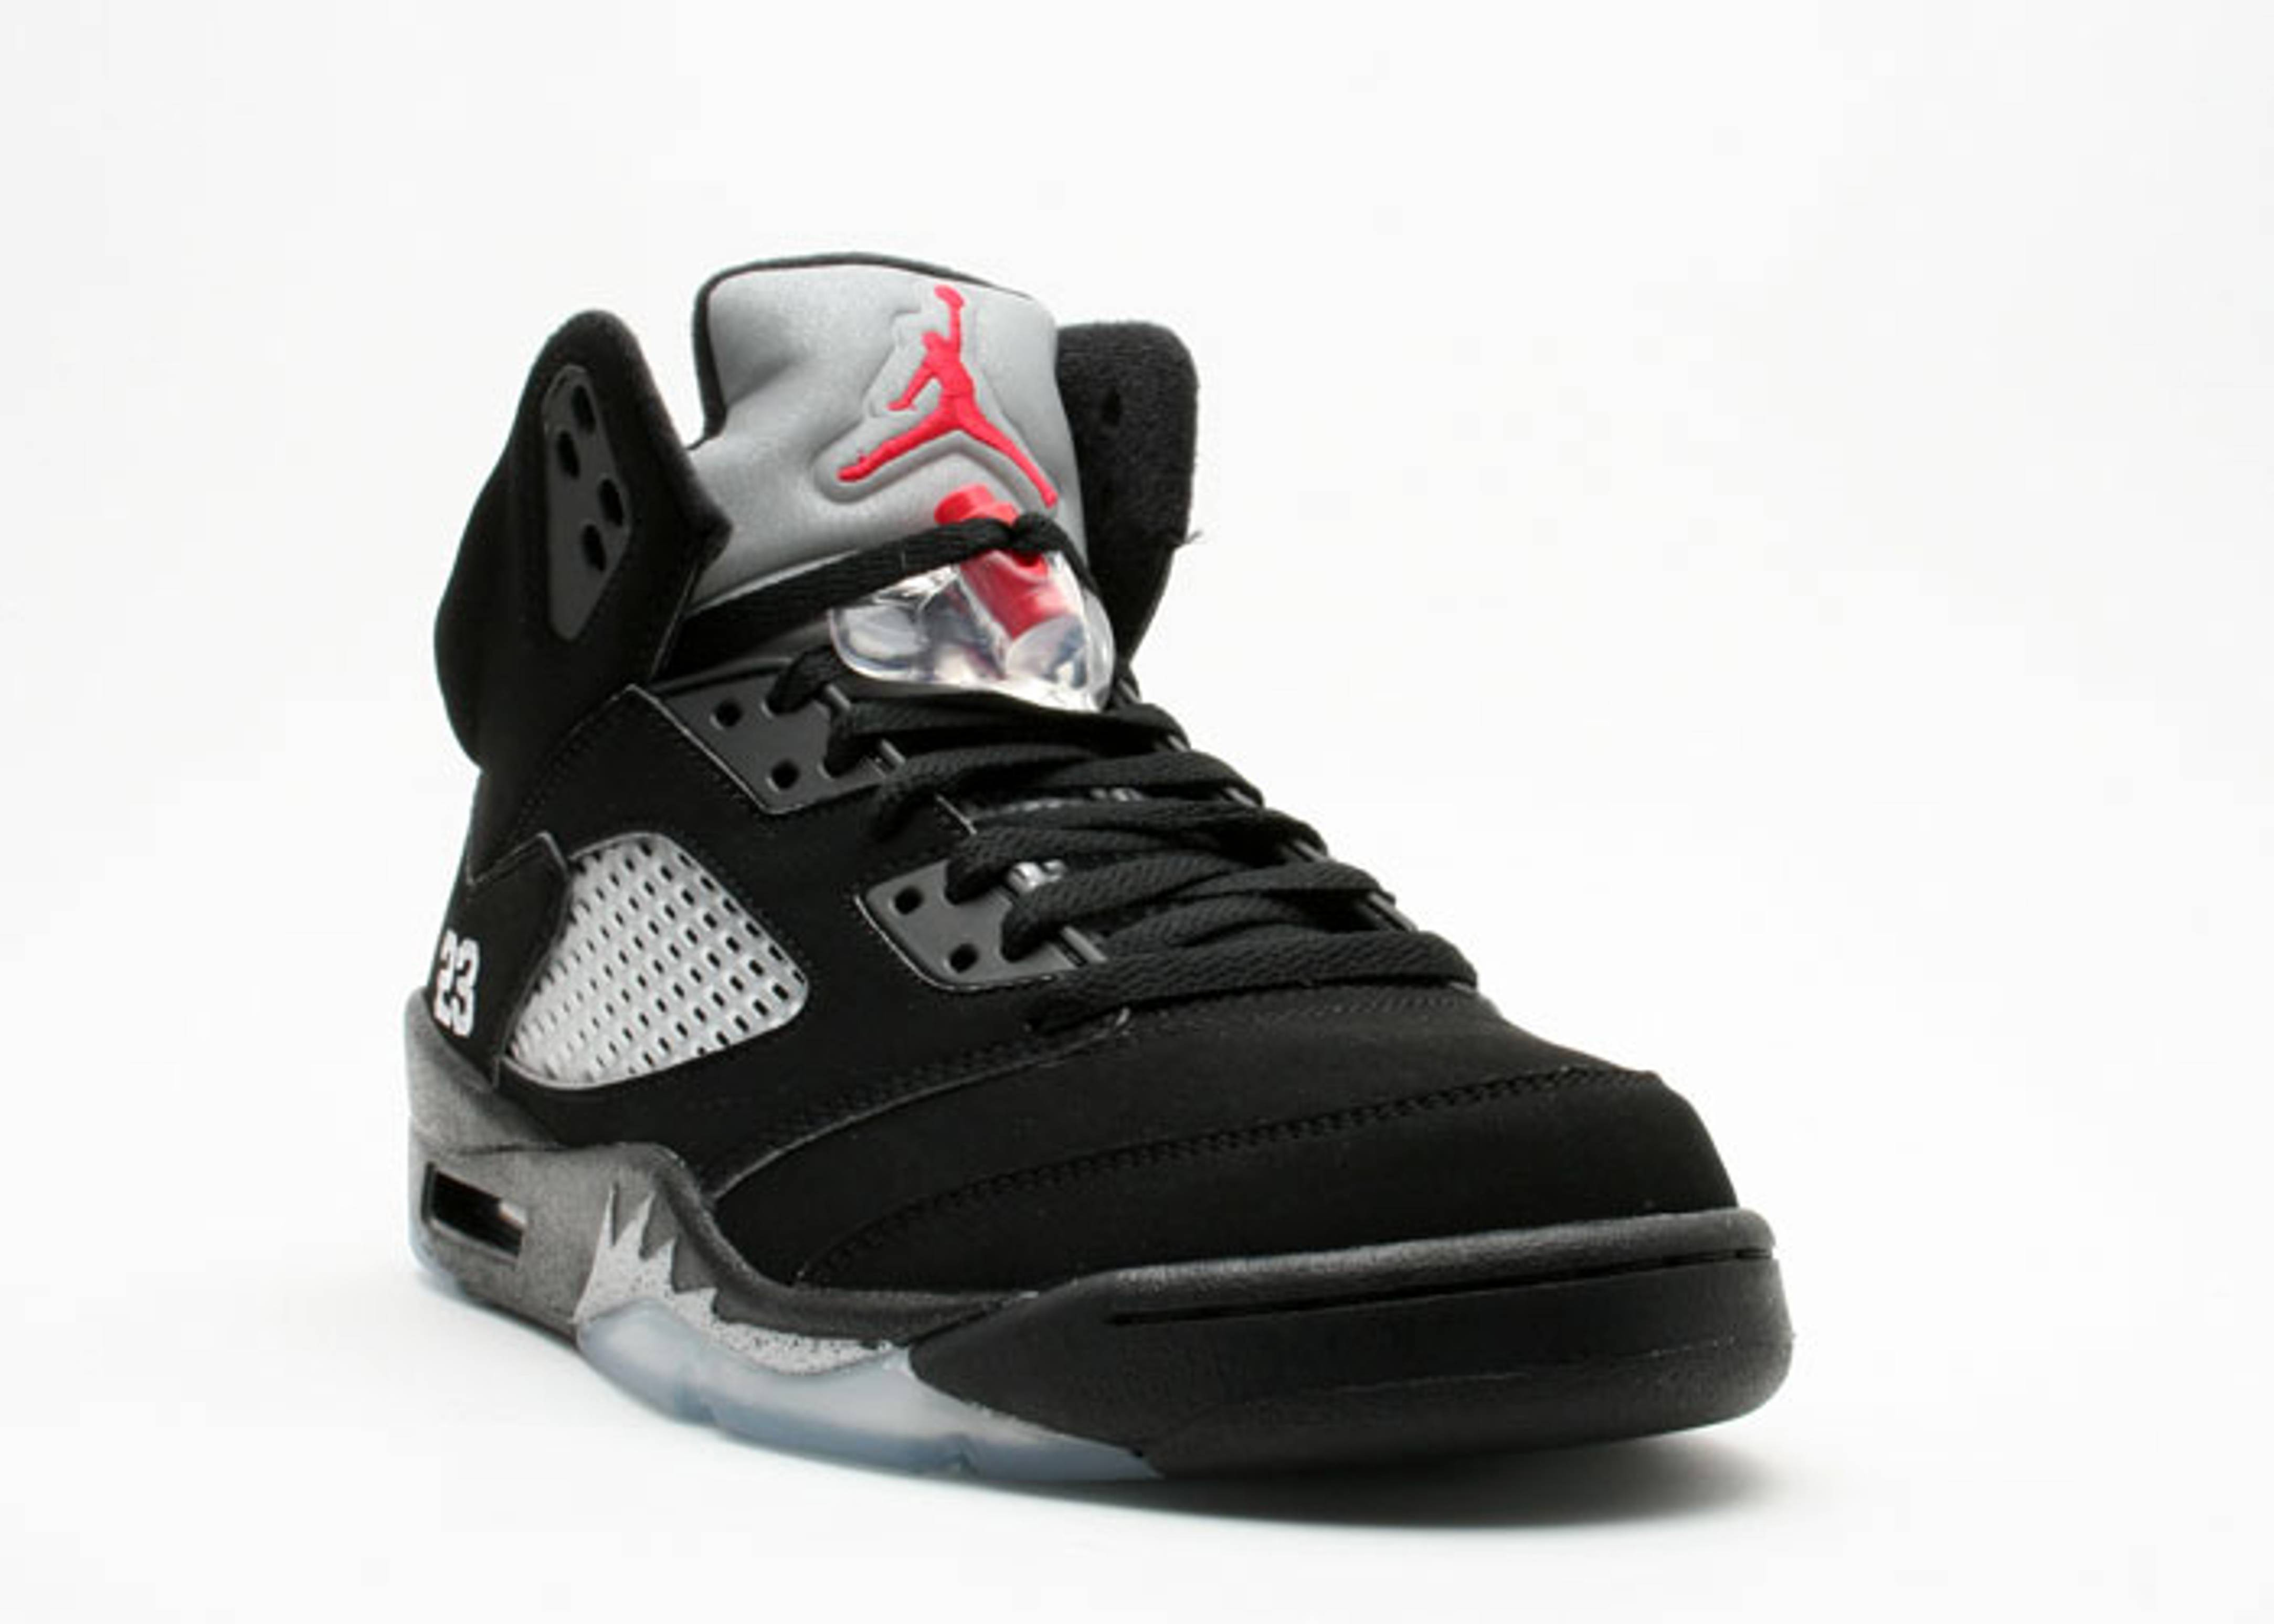 Air Jordan 5 Black